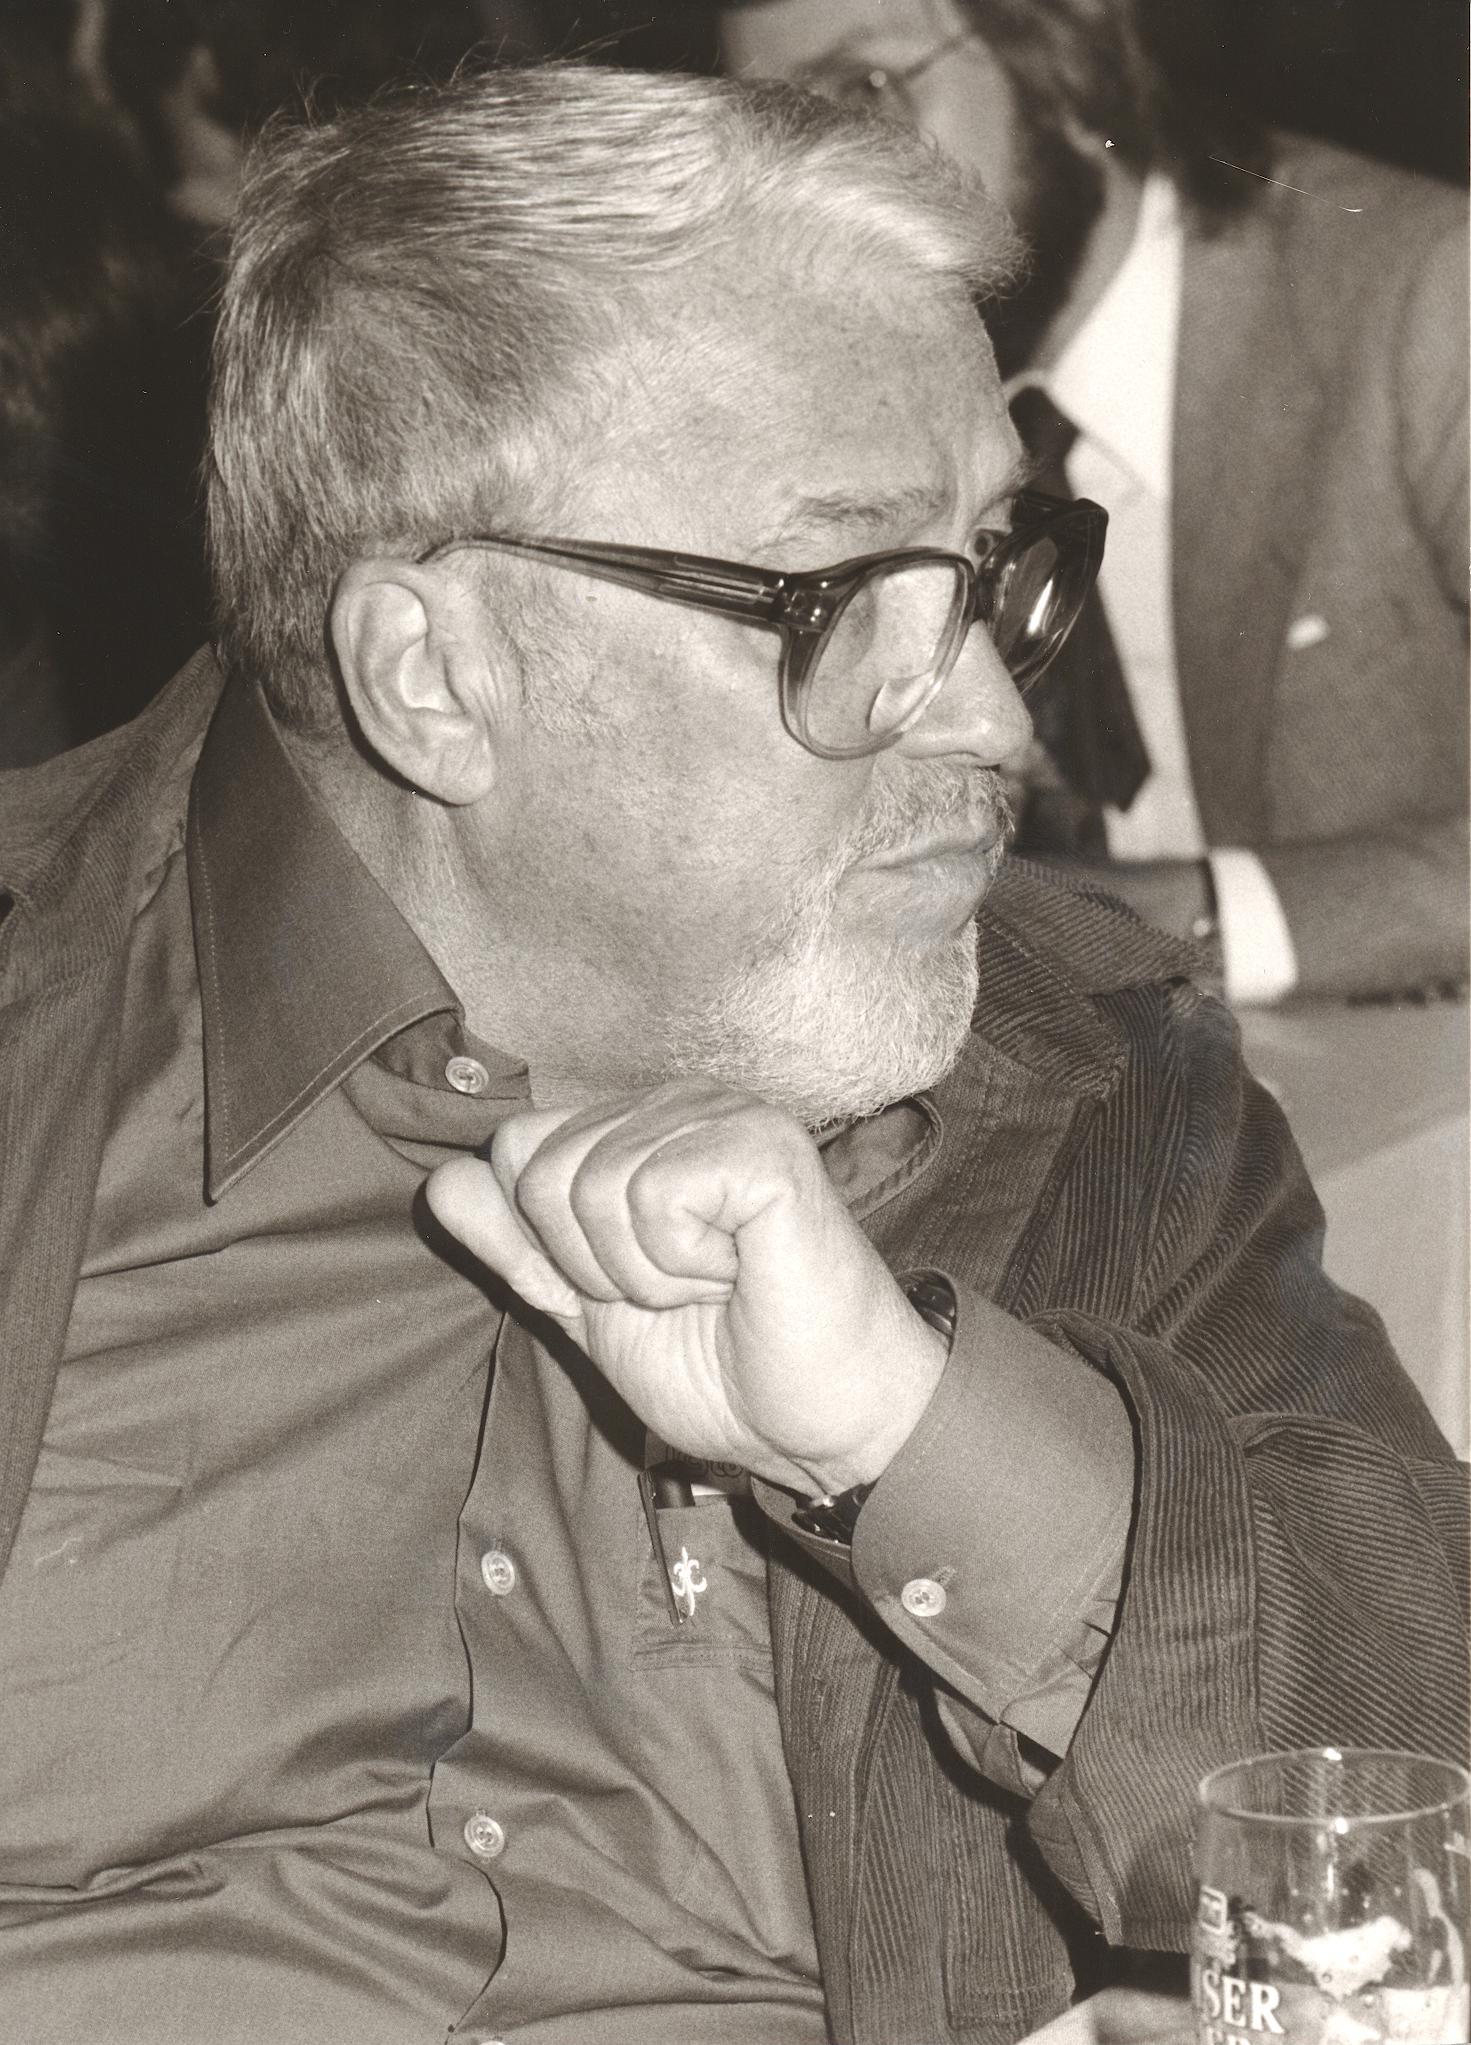 IX. Imago Mundi-Kongress 1982, Innsbruck, Regisseur Rolf Olsen